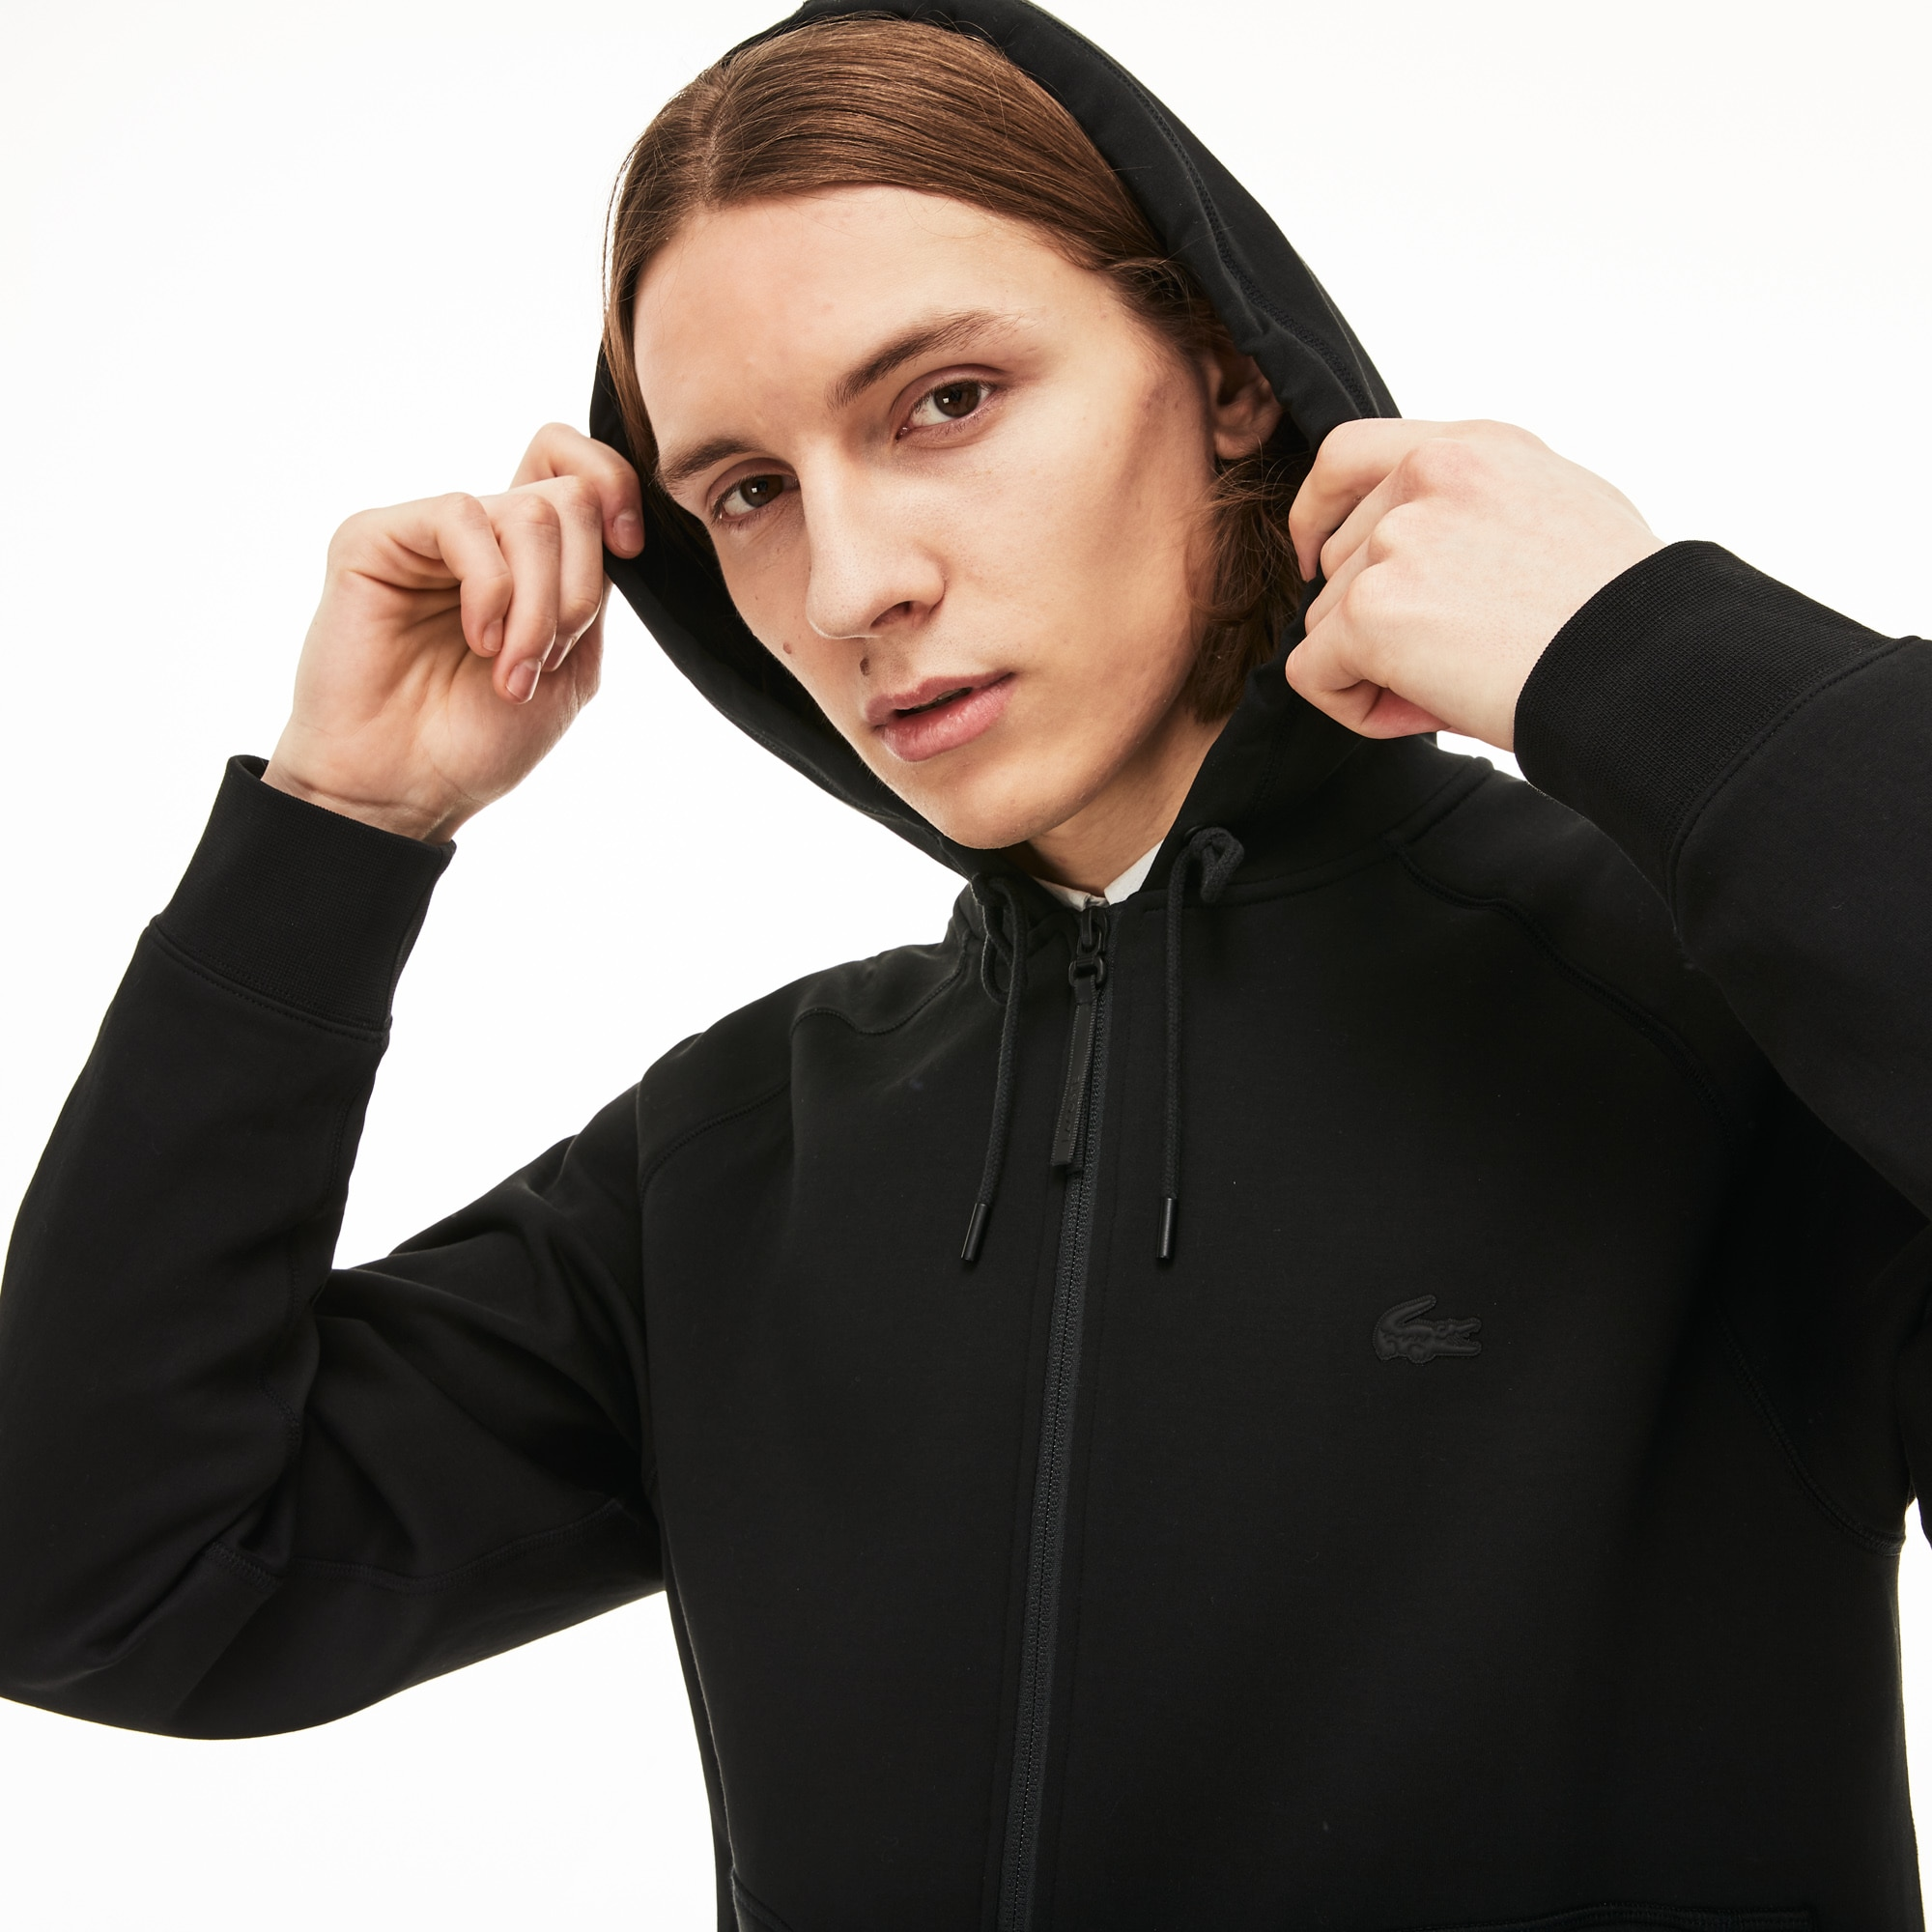 bd8bdf6750c4 Men s Sweatshirts